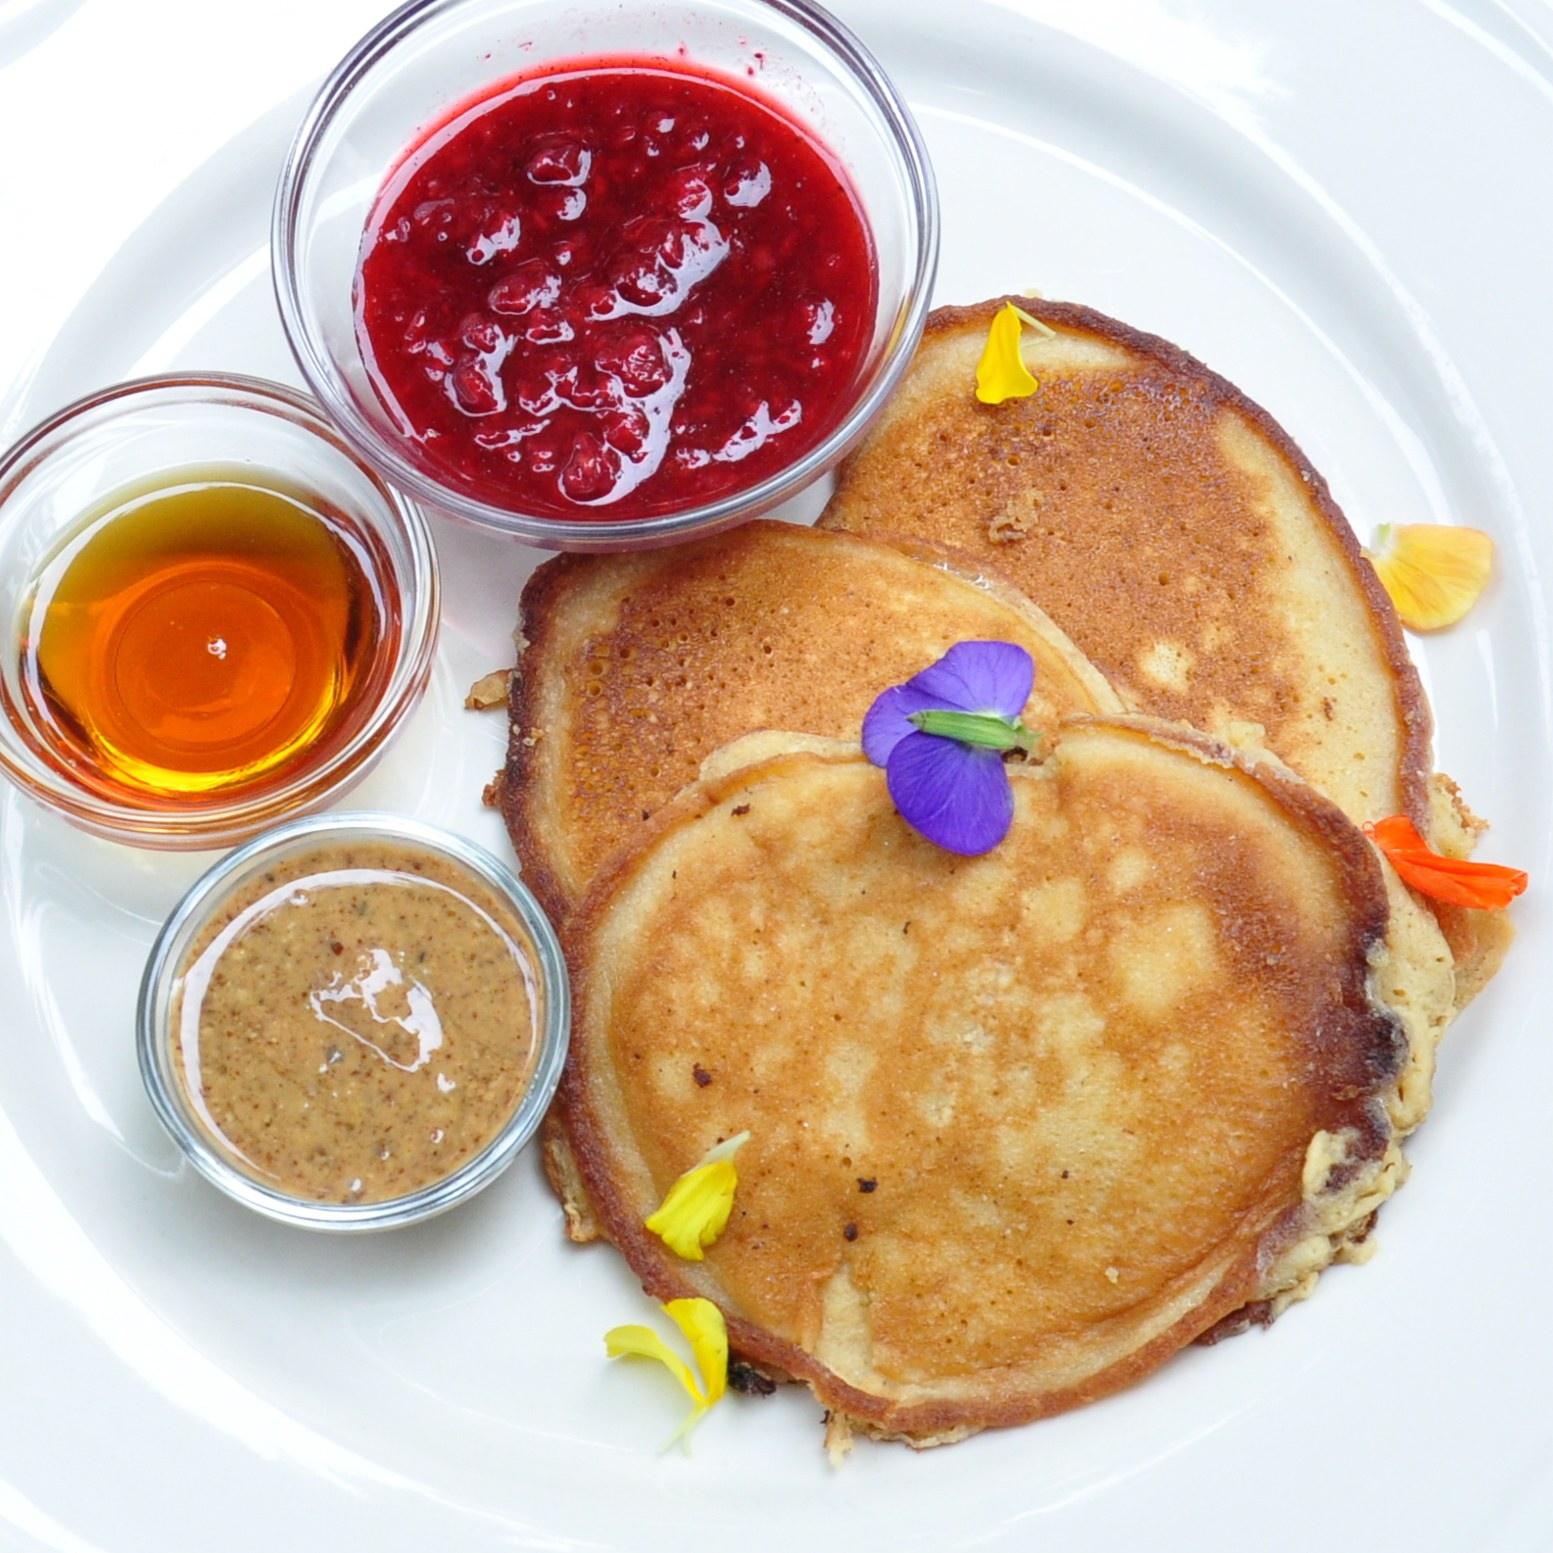 Sauvage-Berlin-Paleo-Restaurant-Fruehstueck-Pancakes